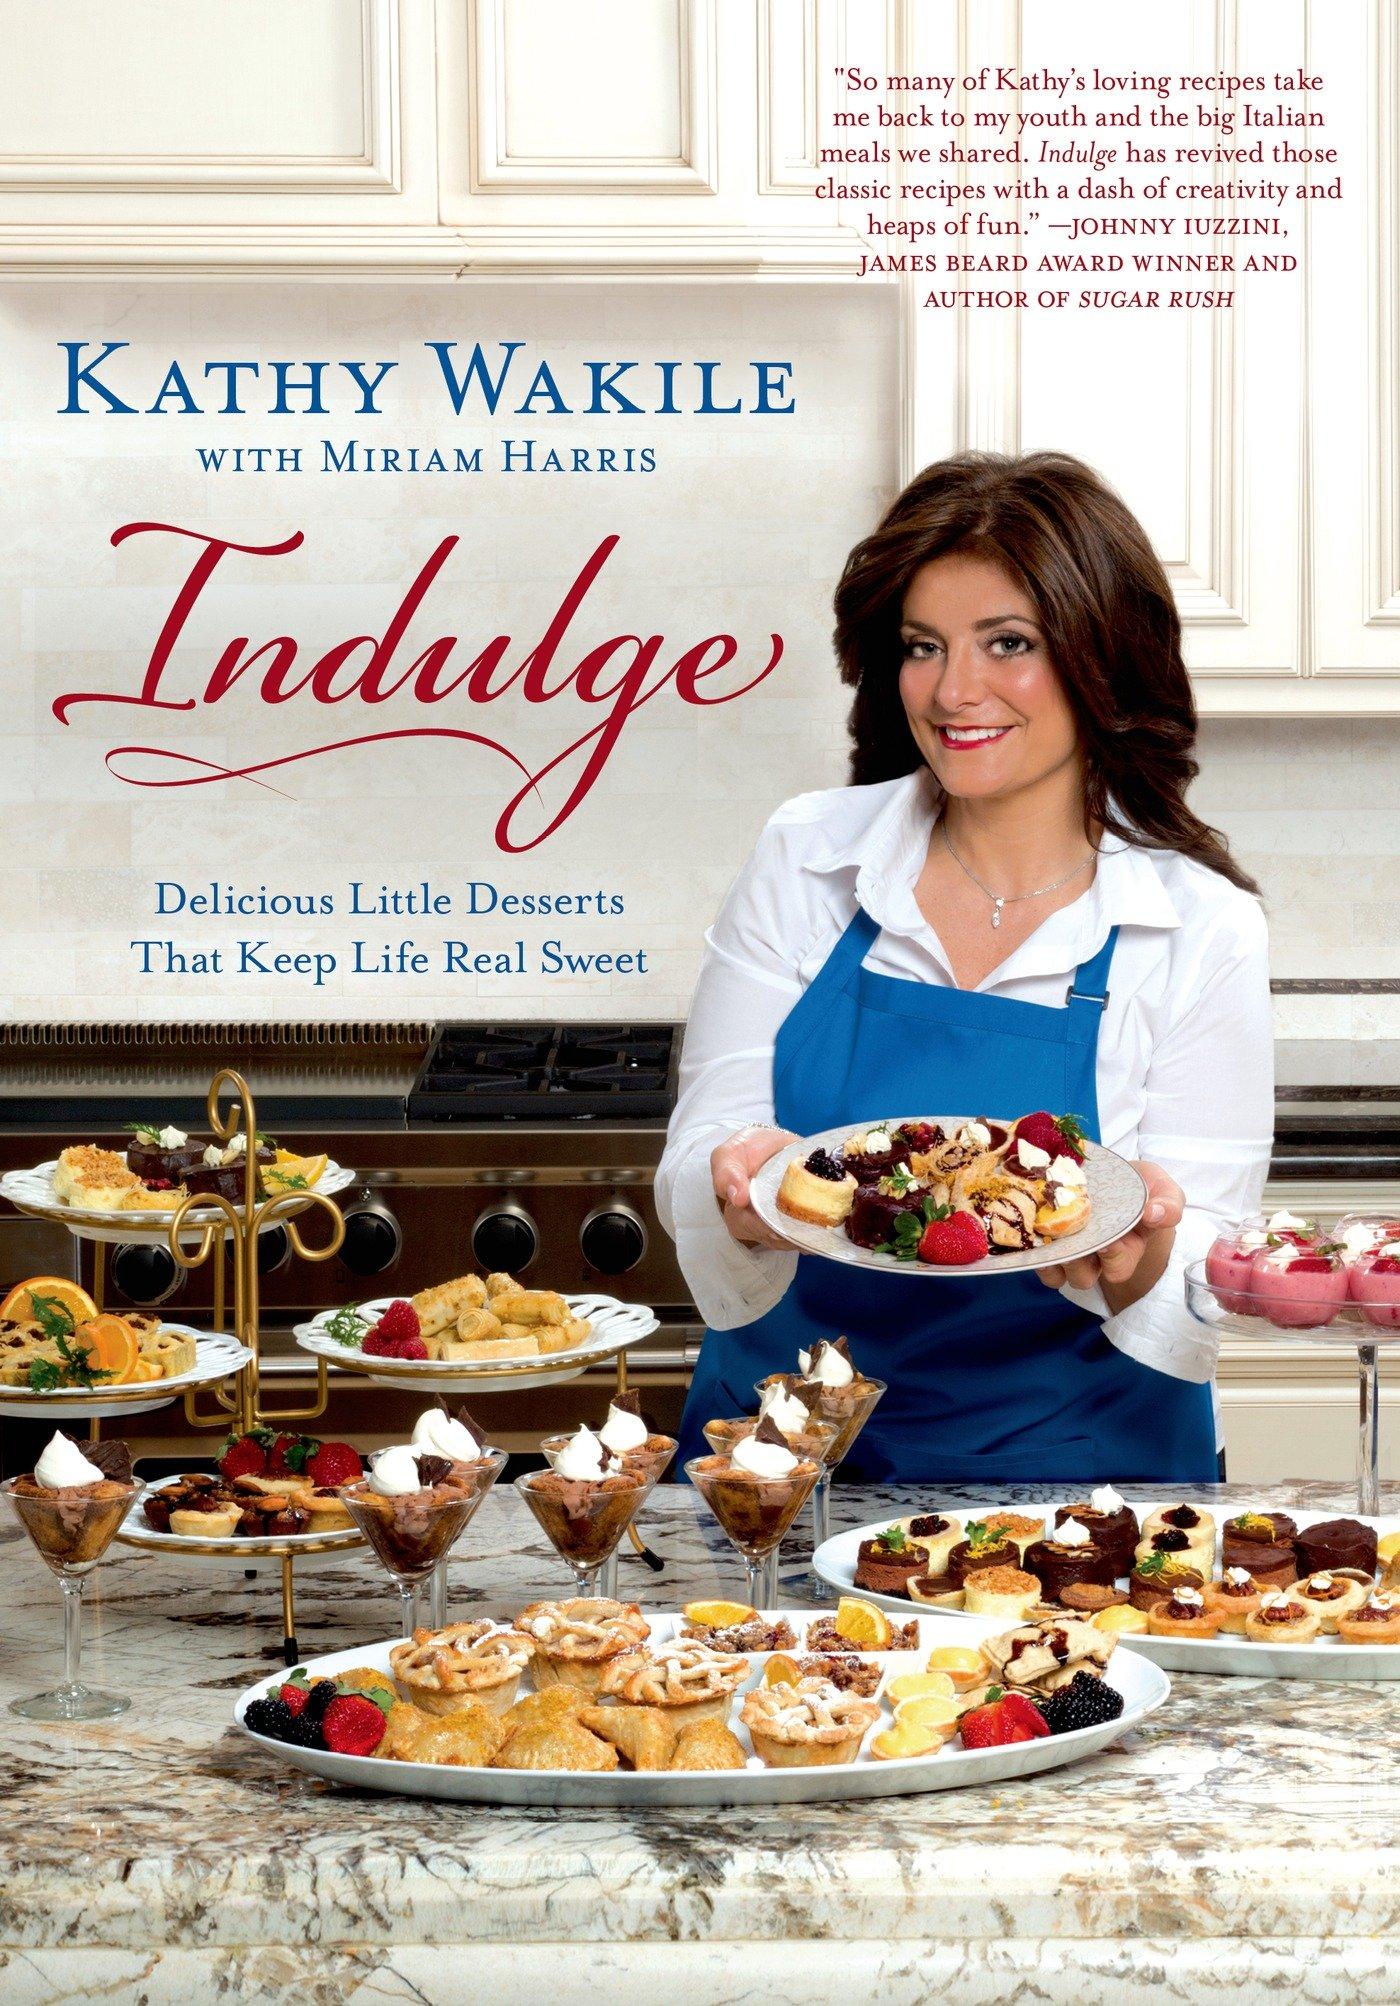 Indulge: Delicious Little Desserts That Keep Life Real Sweet: Kathy Wakile,  Miriam Harris: 9781250051264: Amazon.com: Books